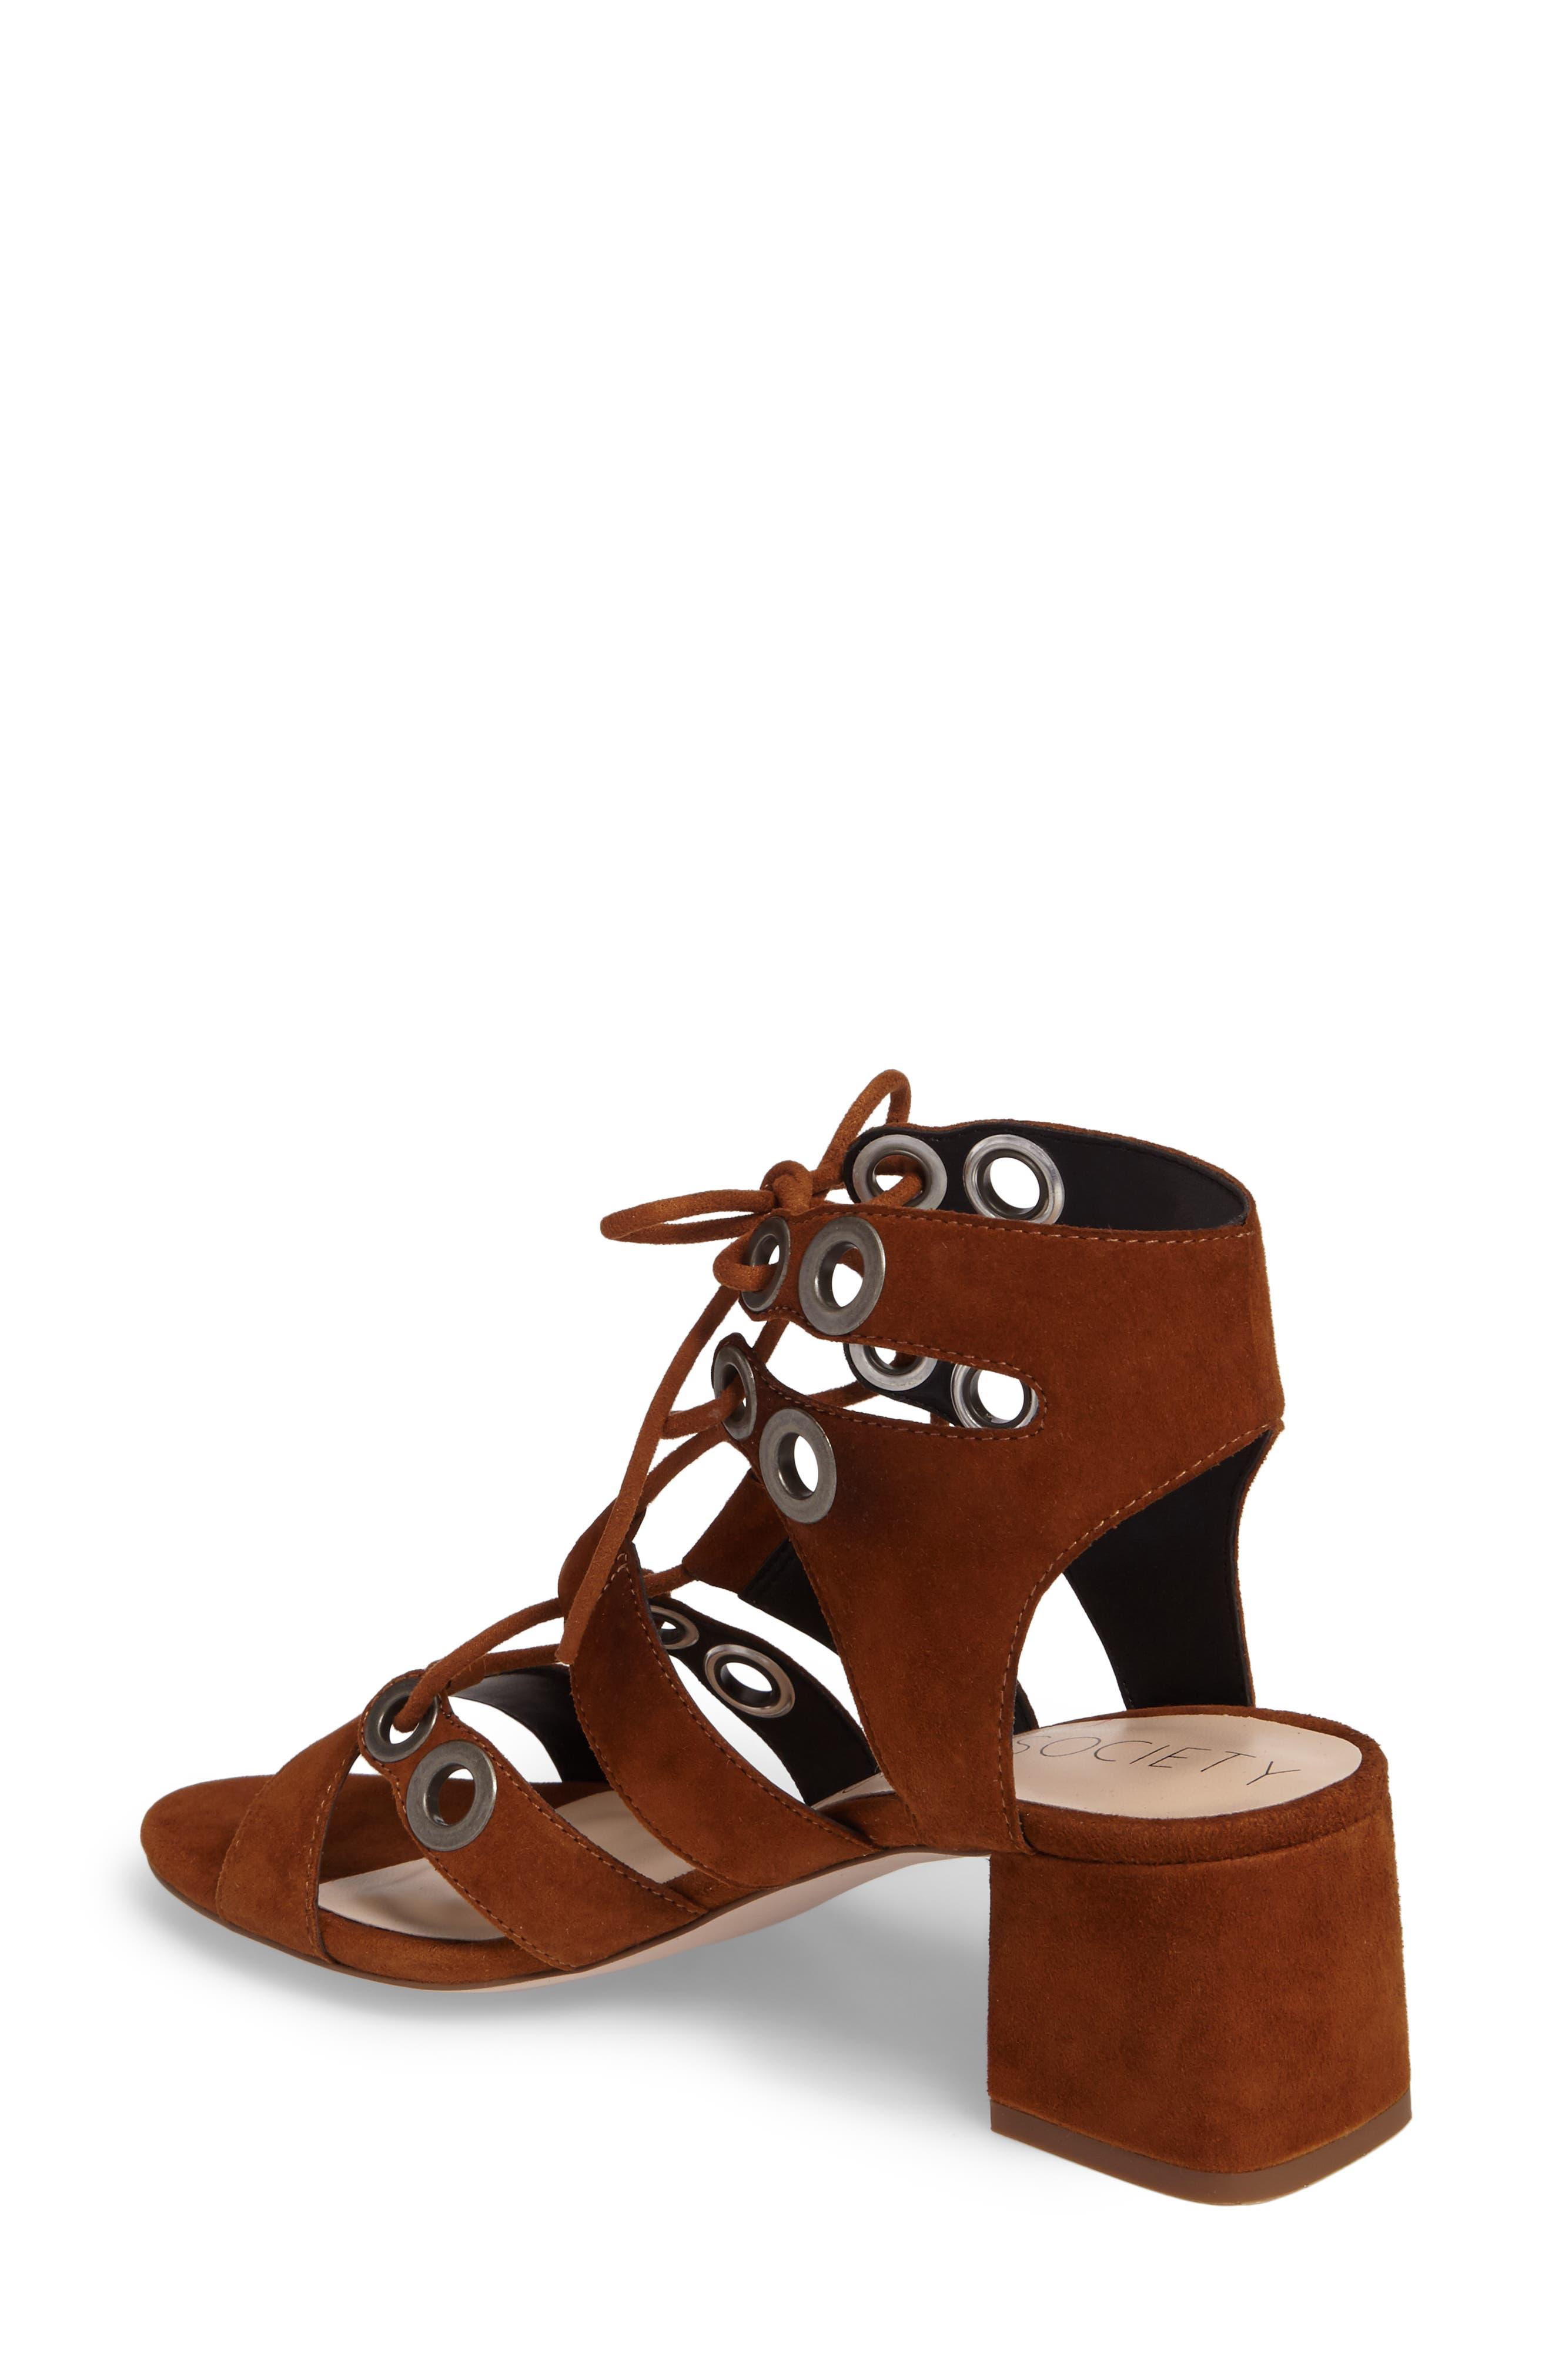 Alternate Image 2  - Sole Society Rosemary Lace-Up Sandal (Women)